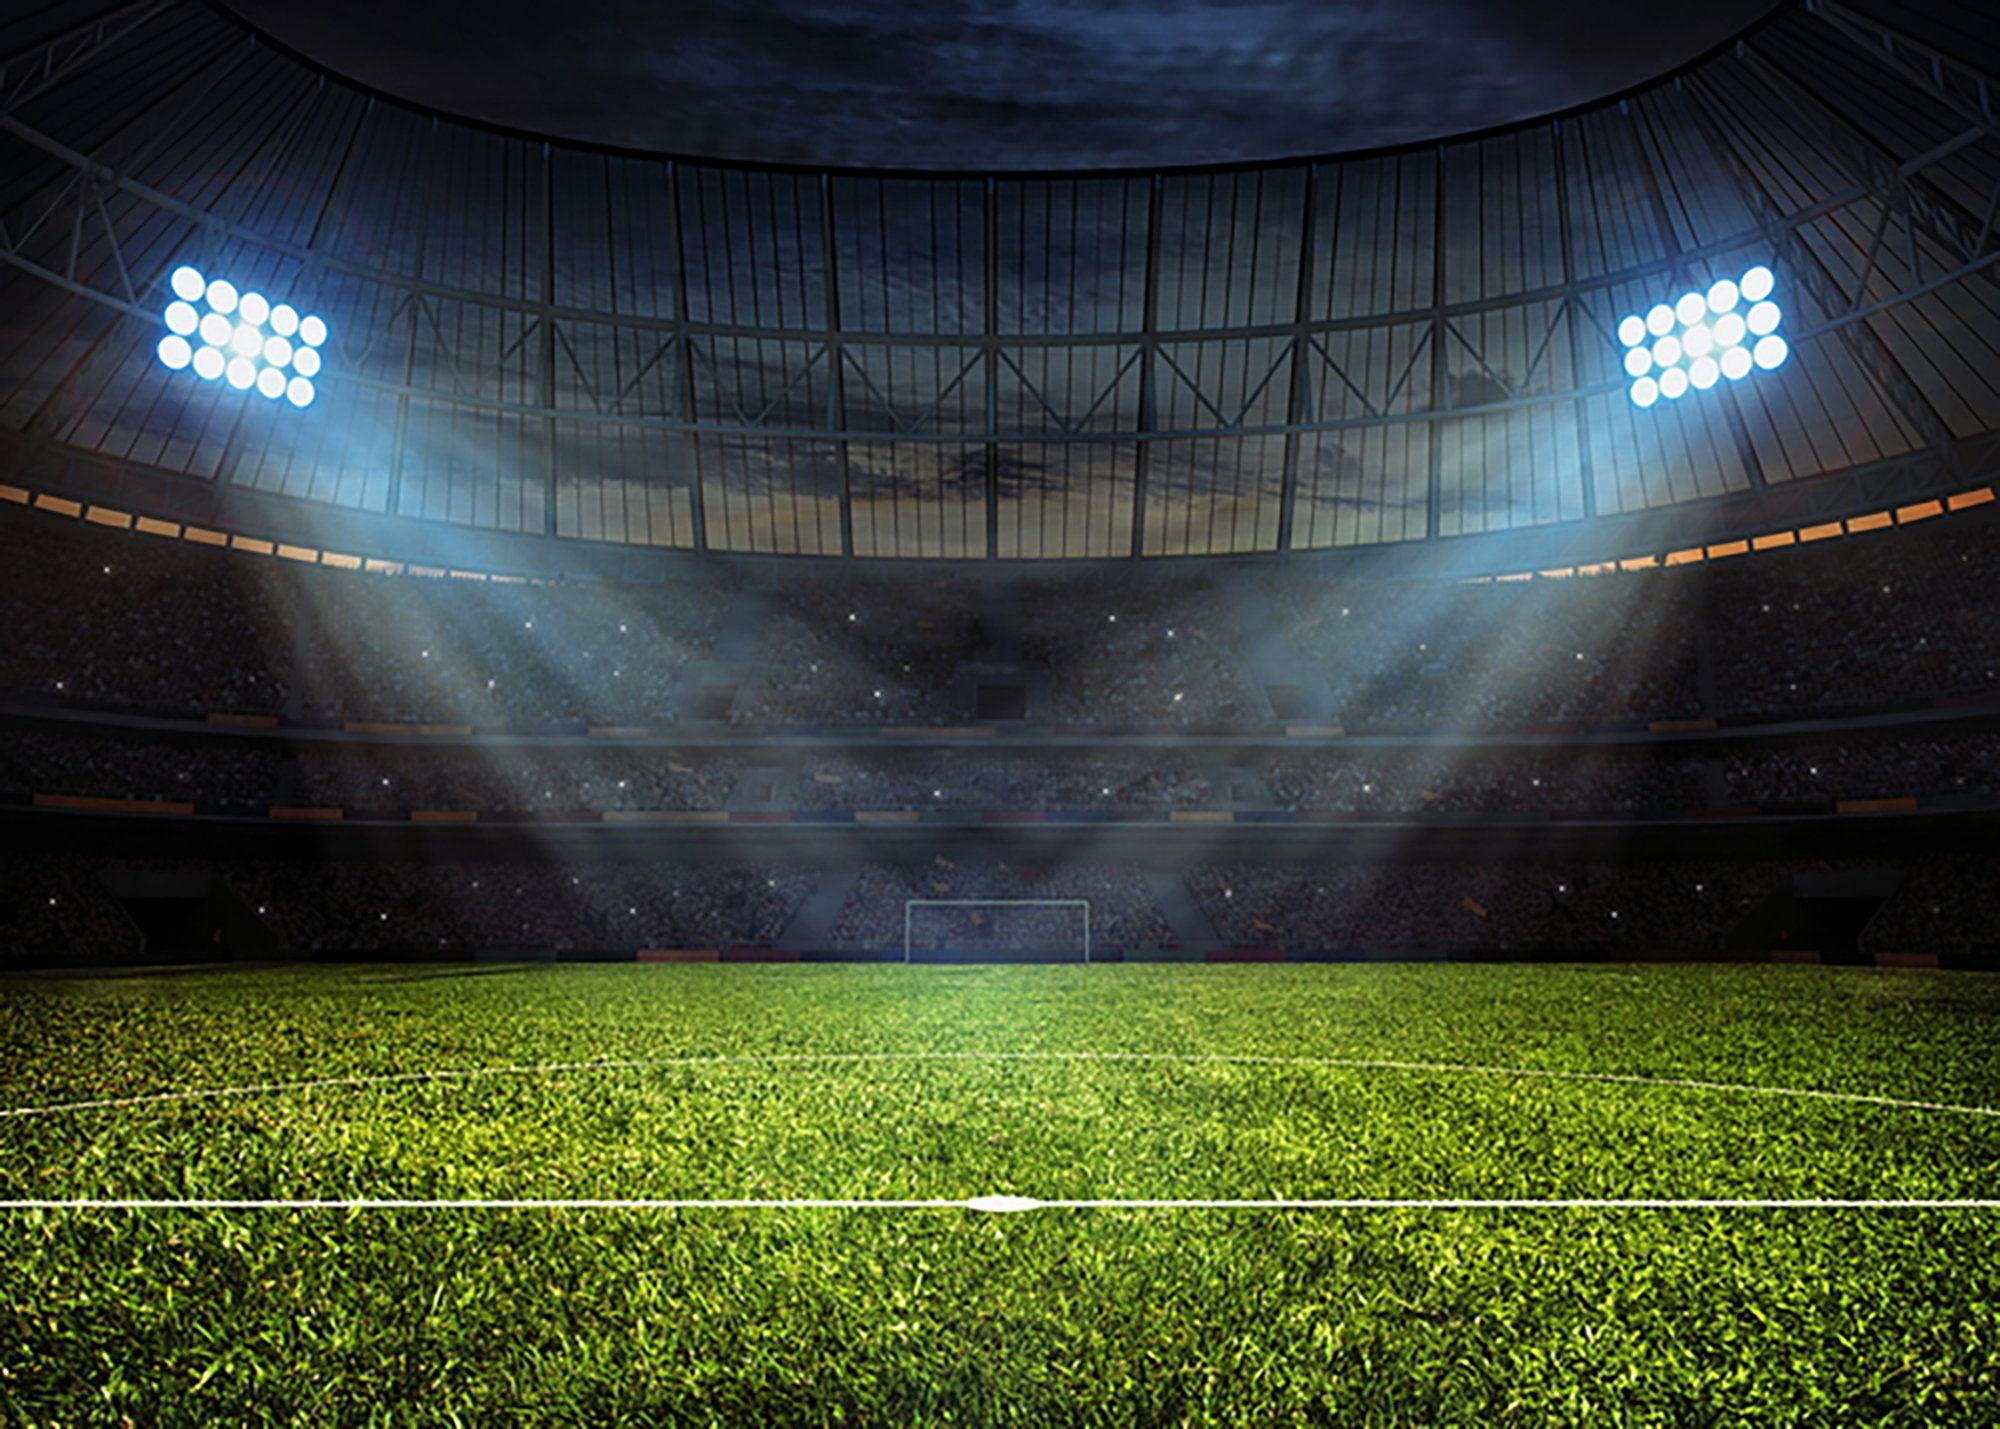 Stadium Backdrop Vinyl Cloth Backdrop Photography Football Etsy In 2020 Football Stadiums Stadium Wallpaper Football Pitch